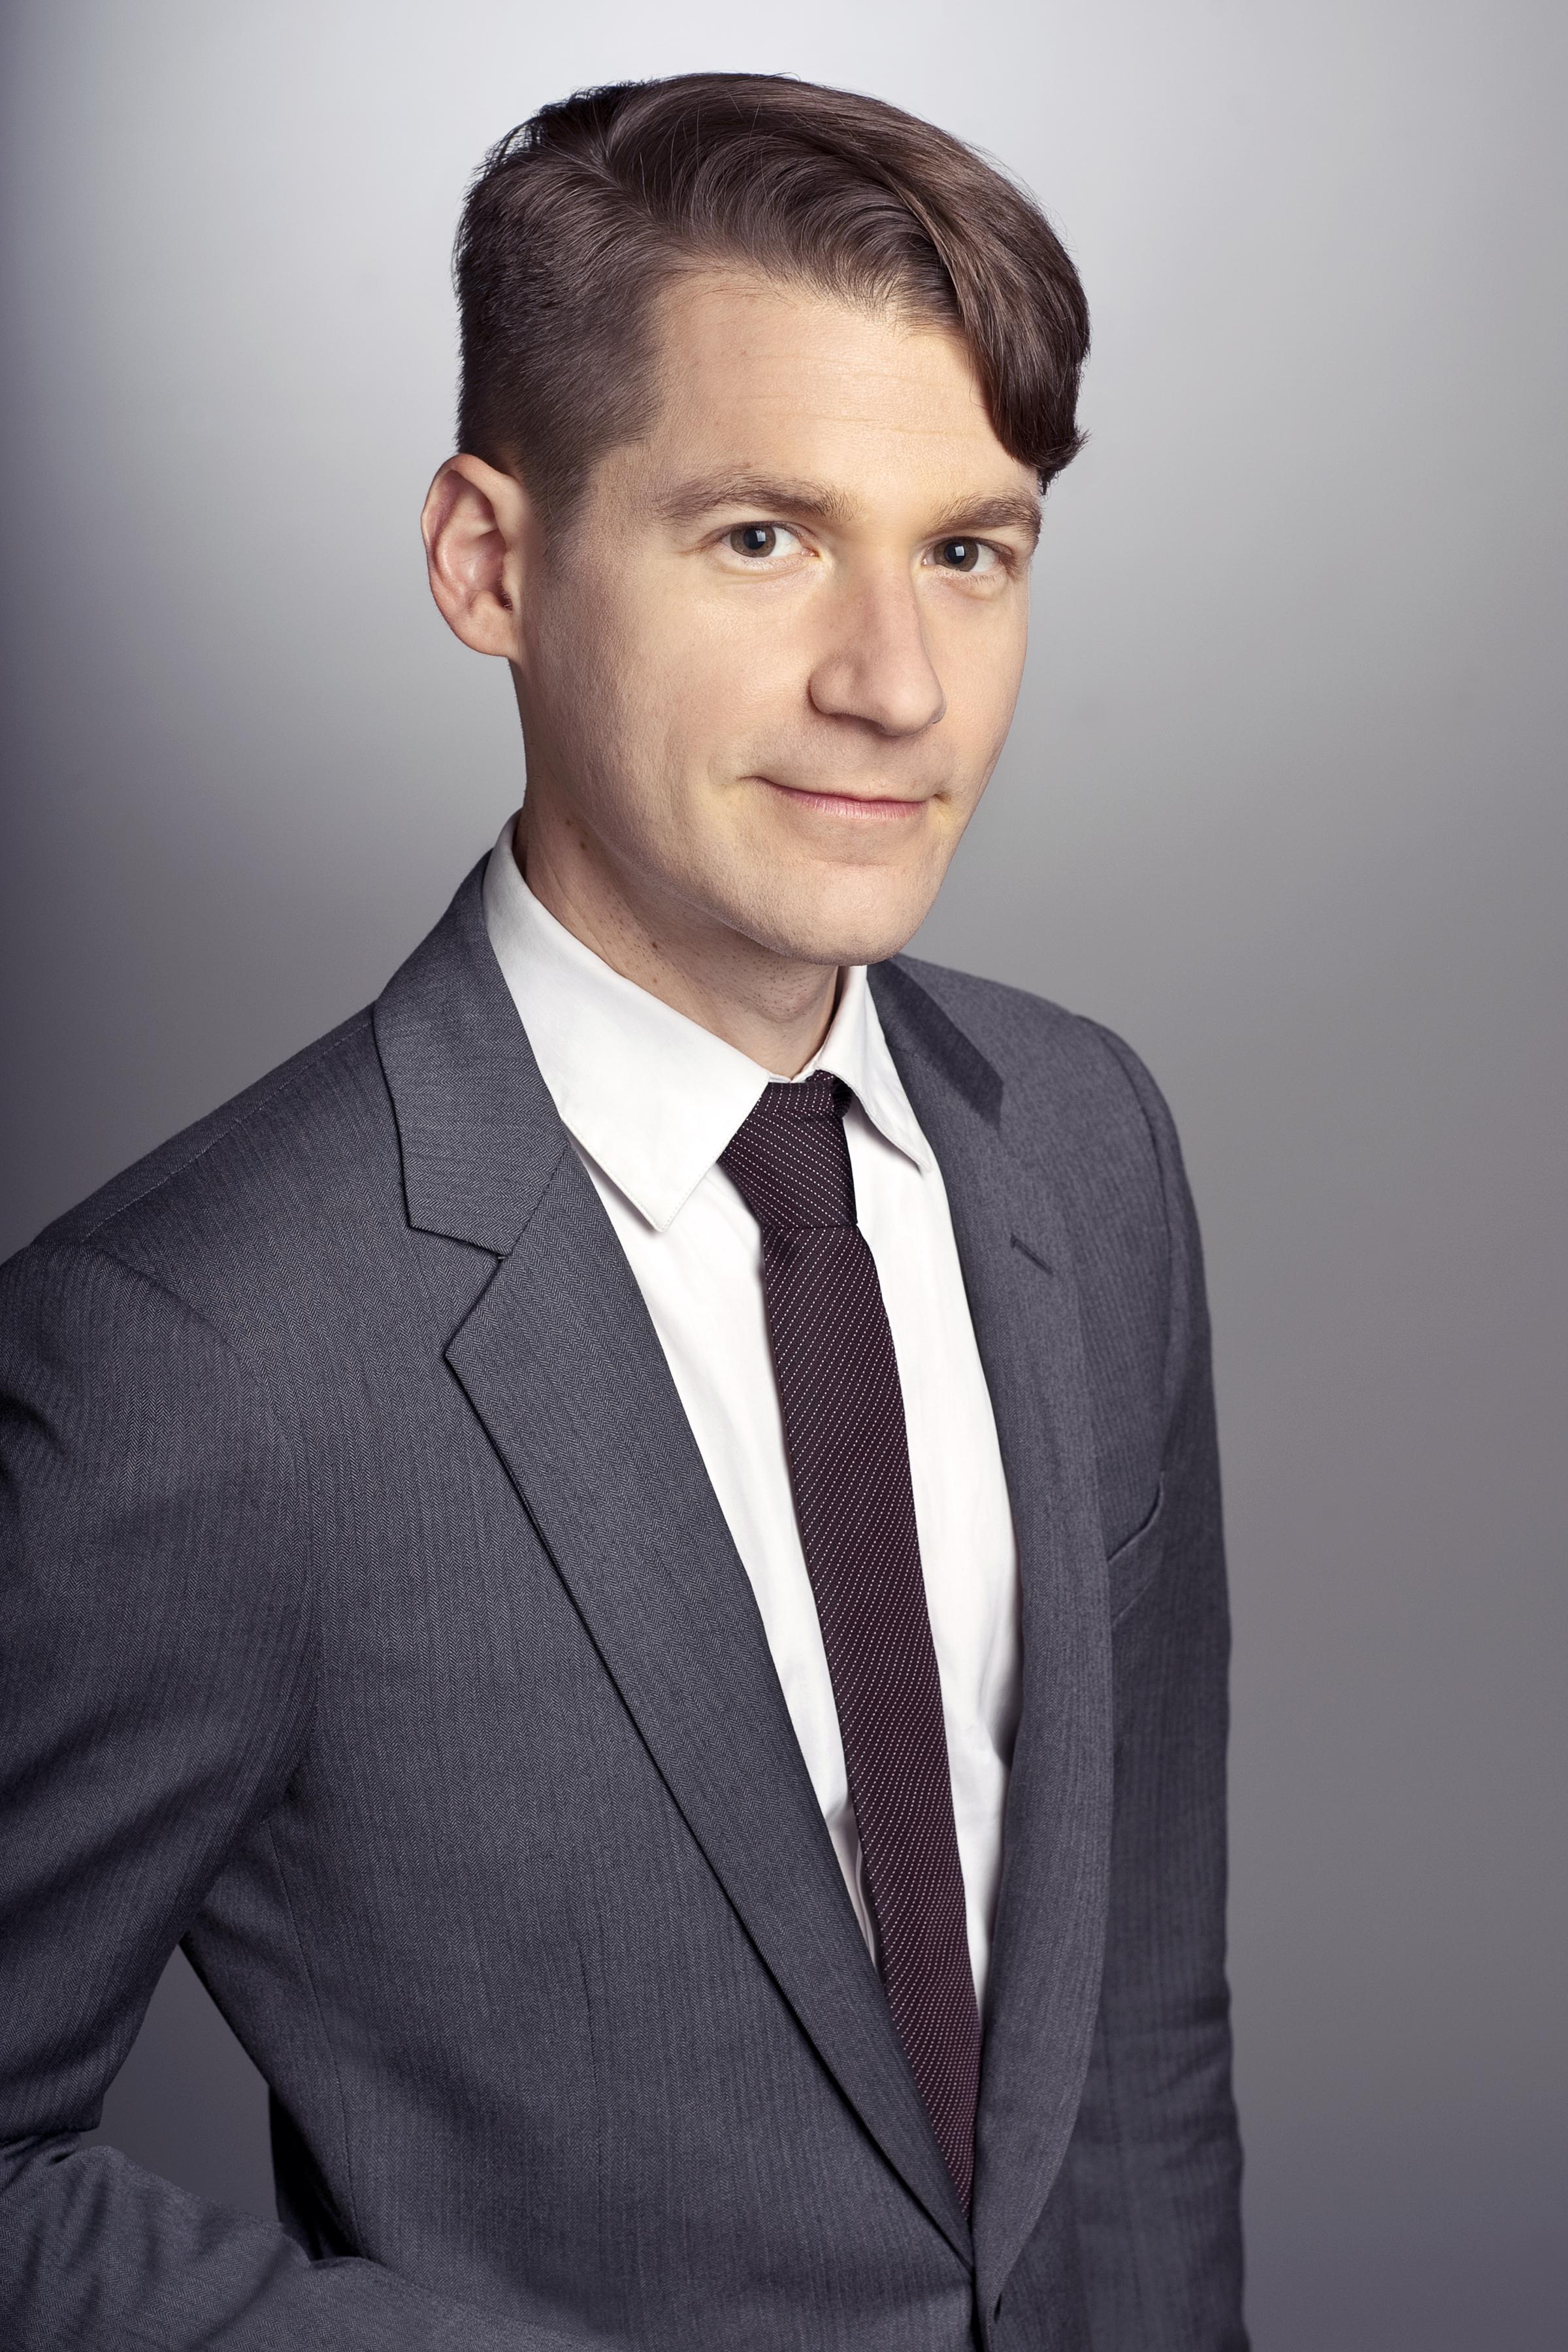 David Headshot Grey Suit Side Profile.jpg